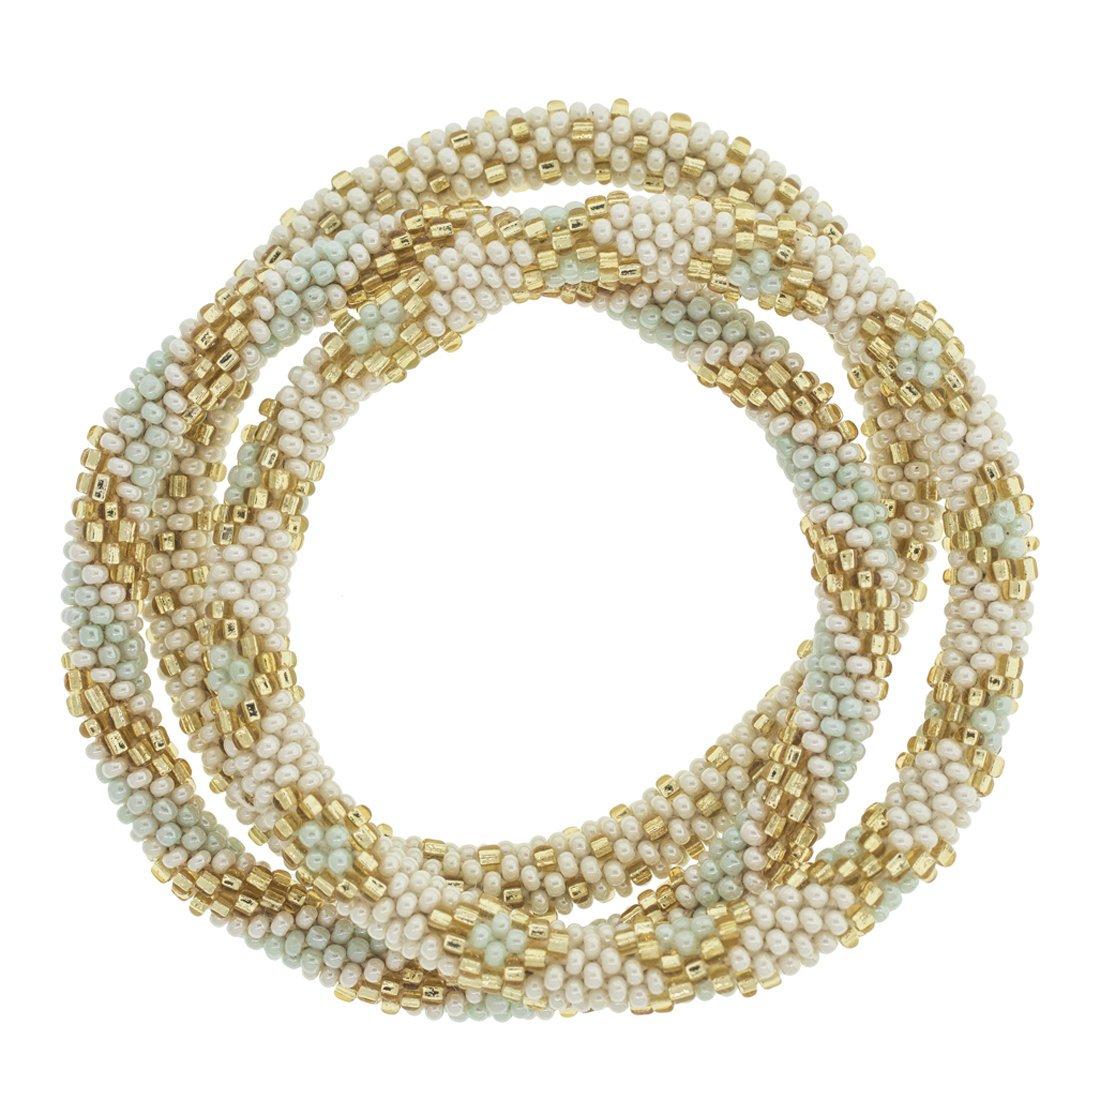 3 sæt Perle armbånd Mint